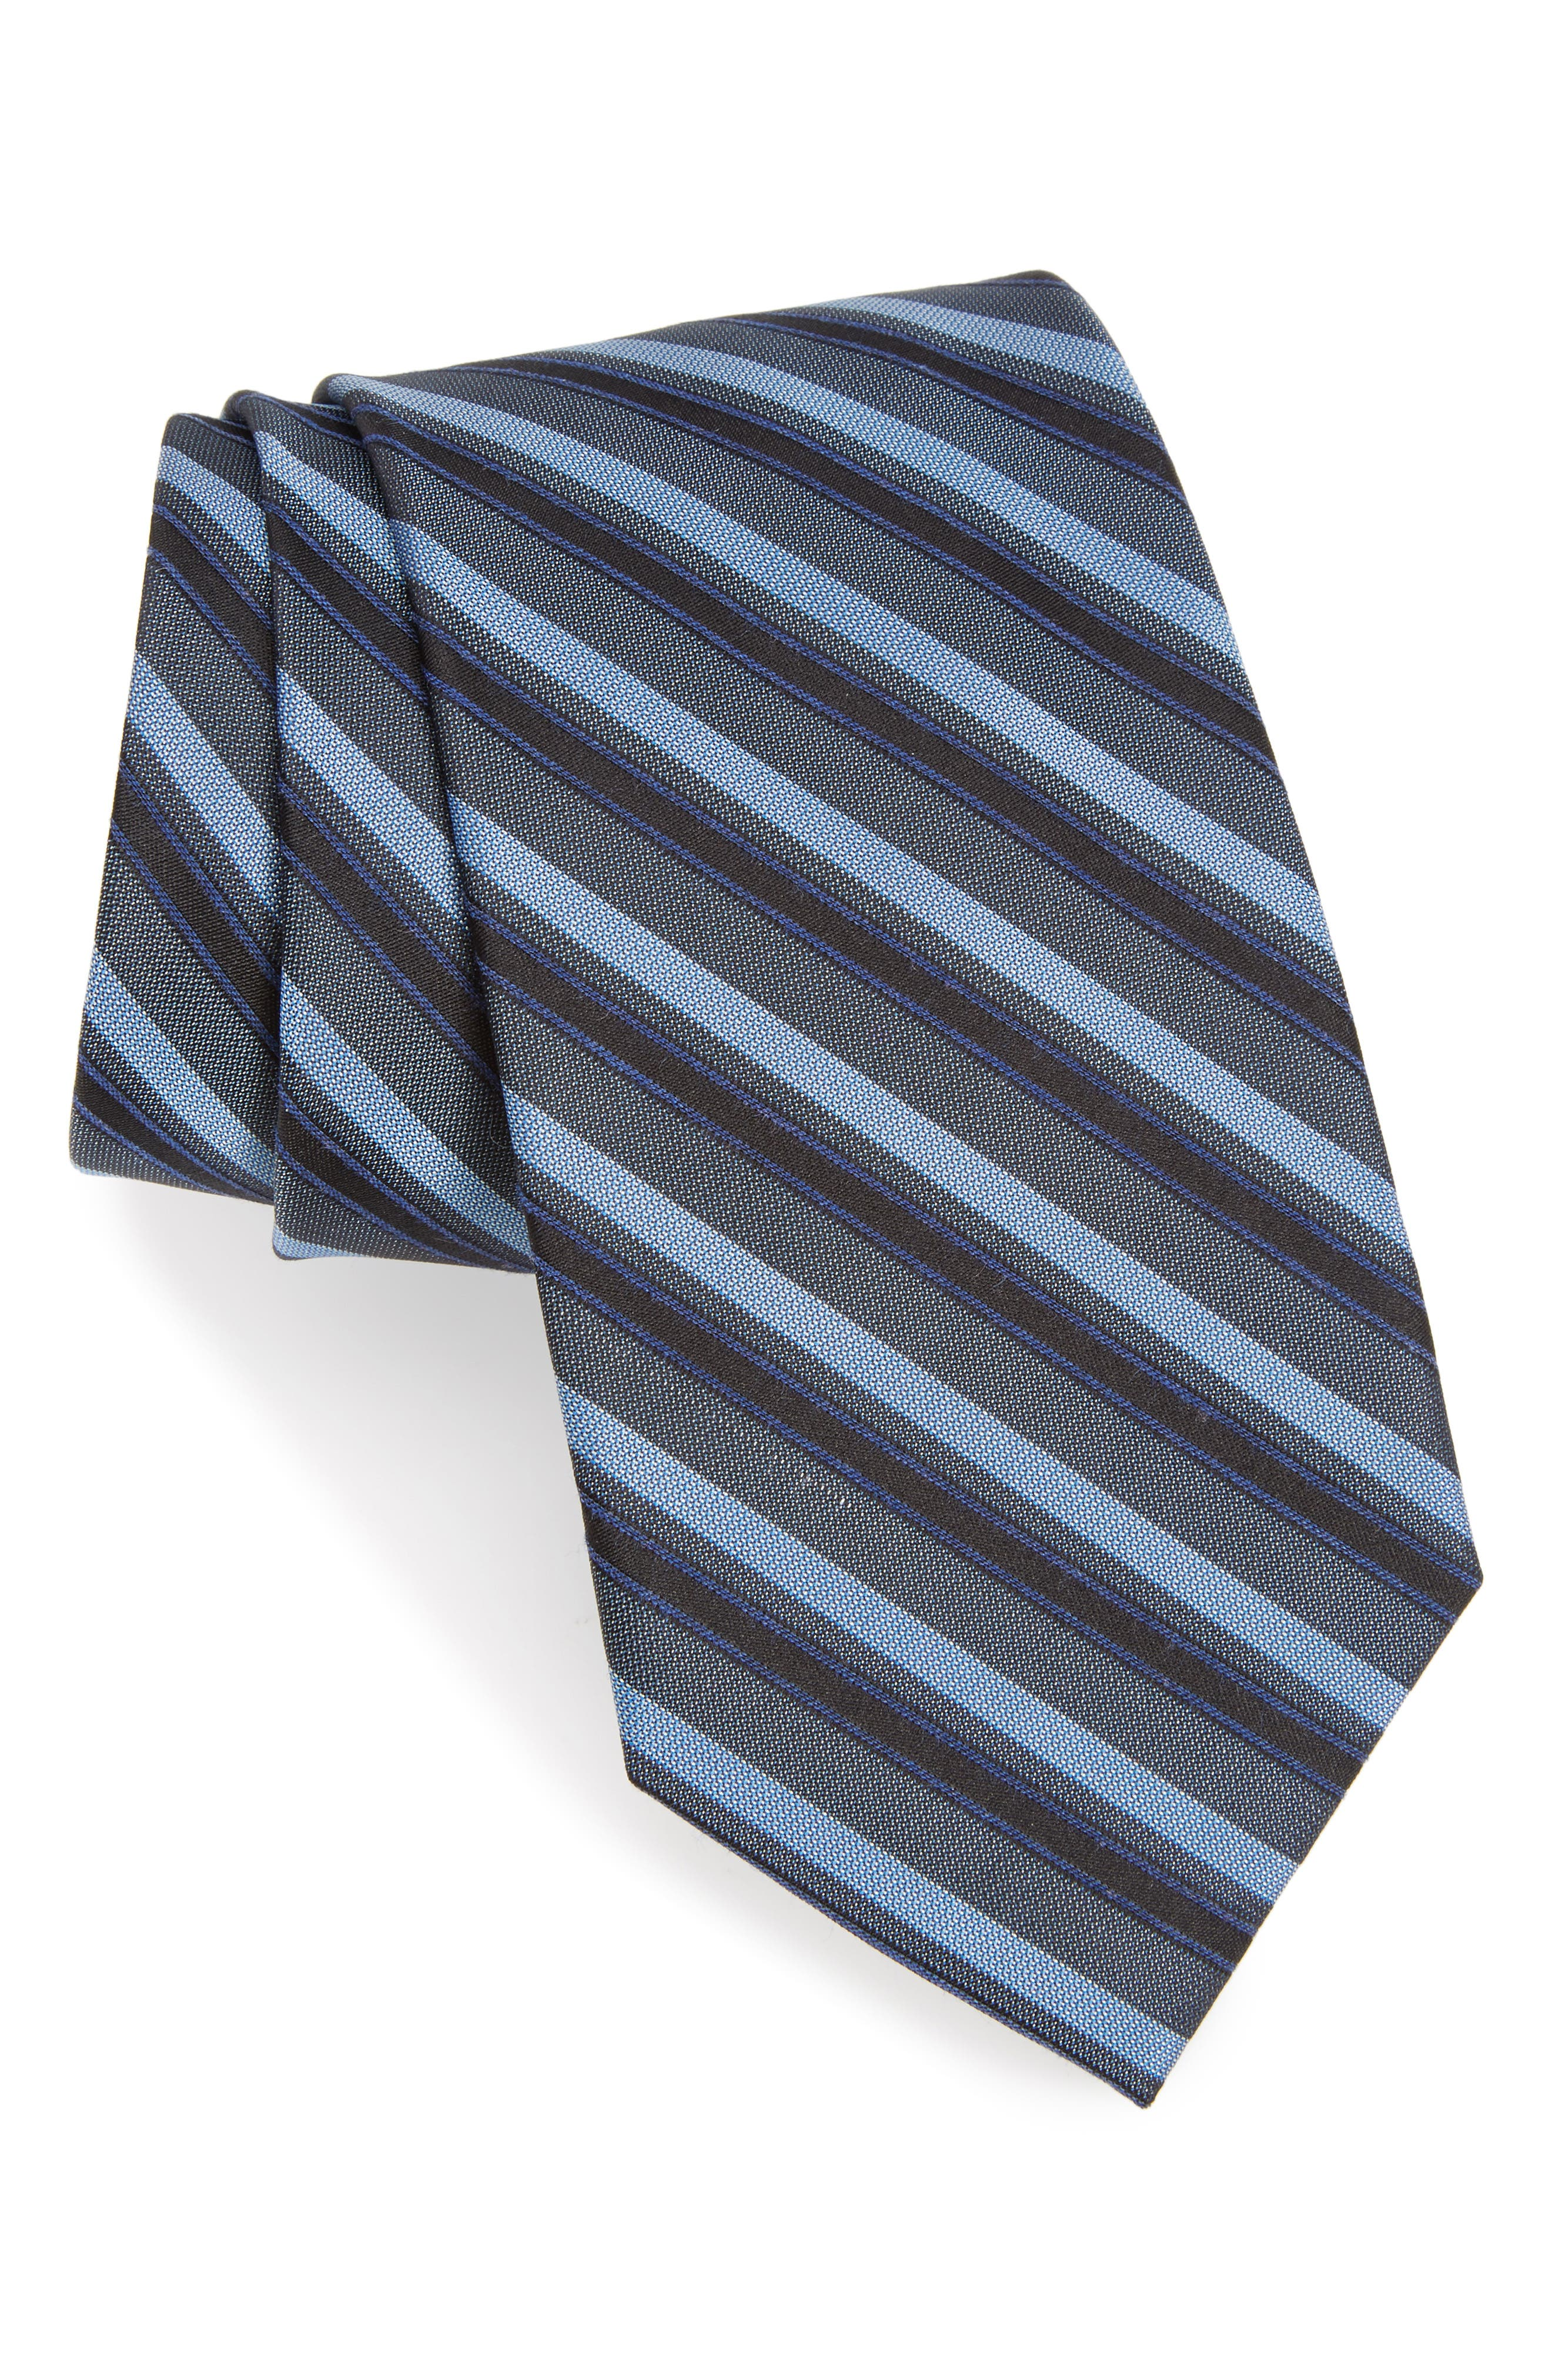 Main Image - Calibrate Shadow Stripe Tie